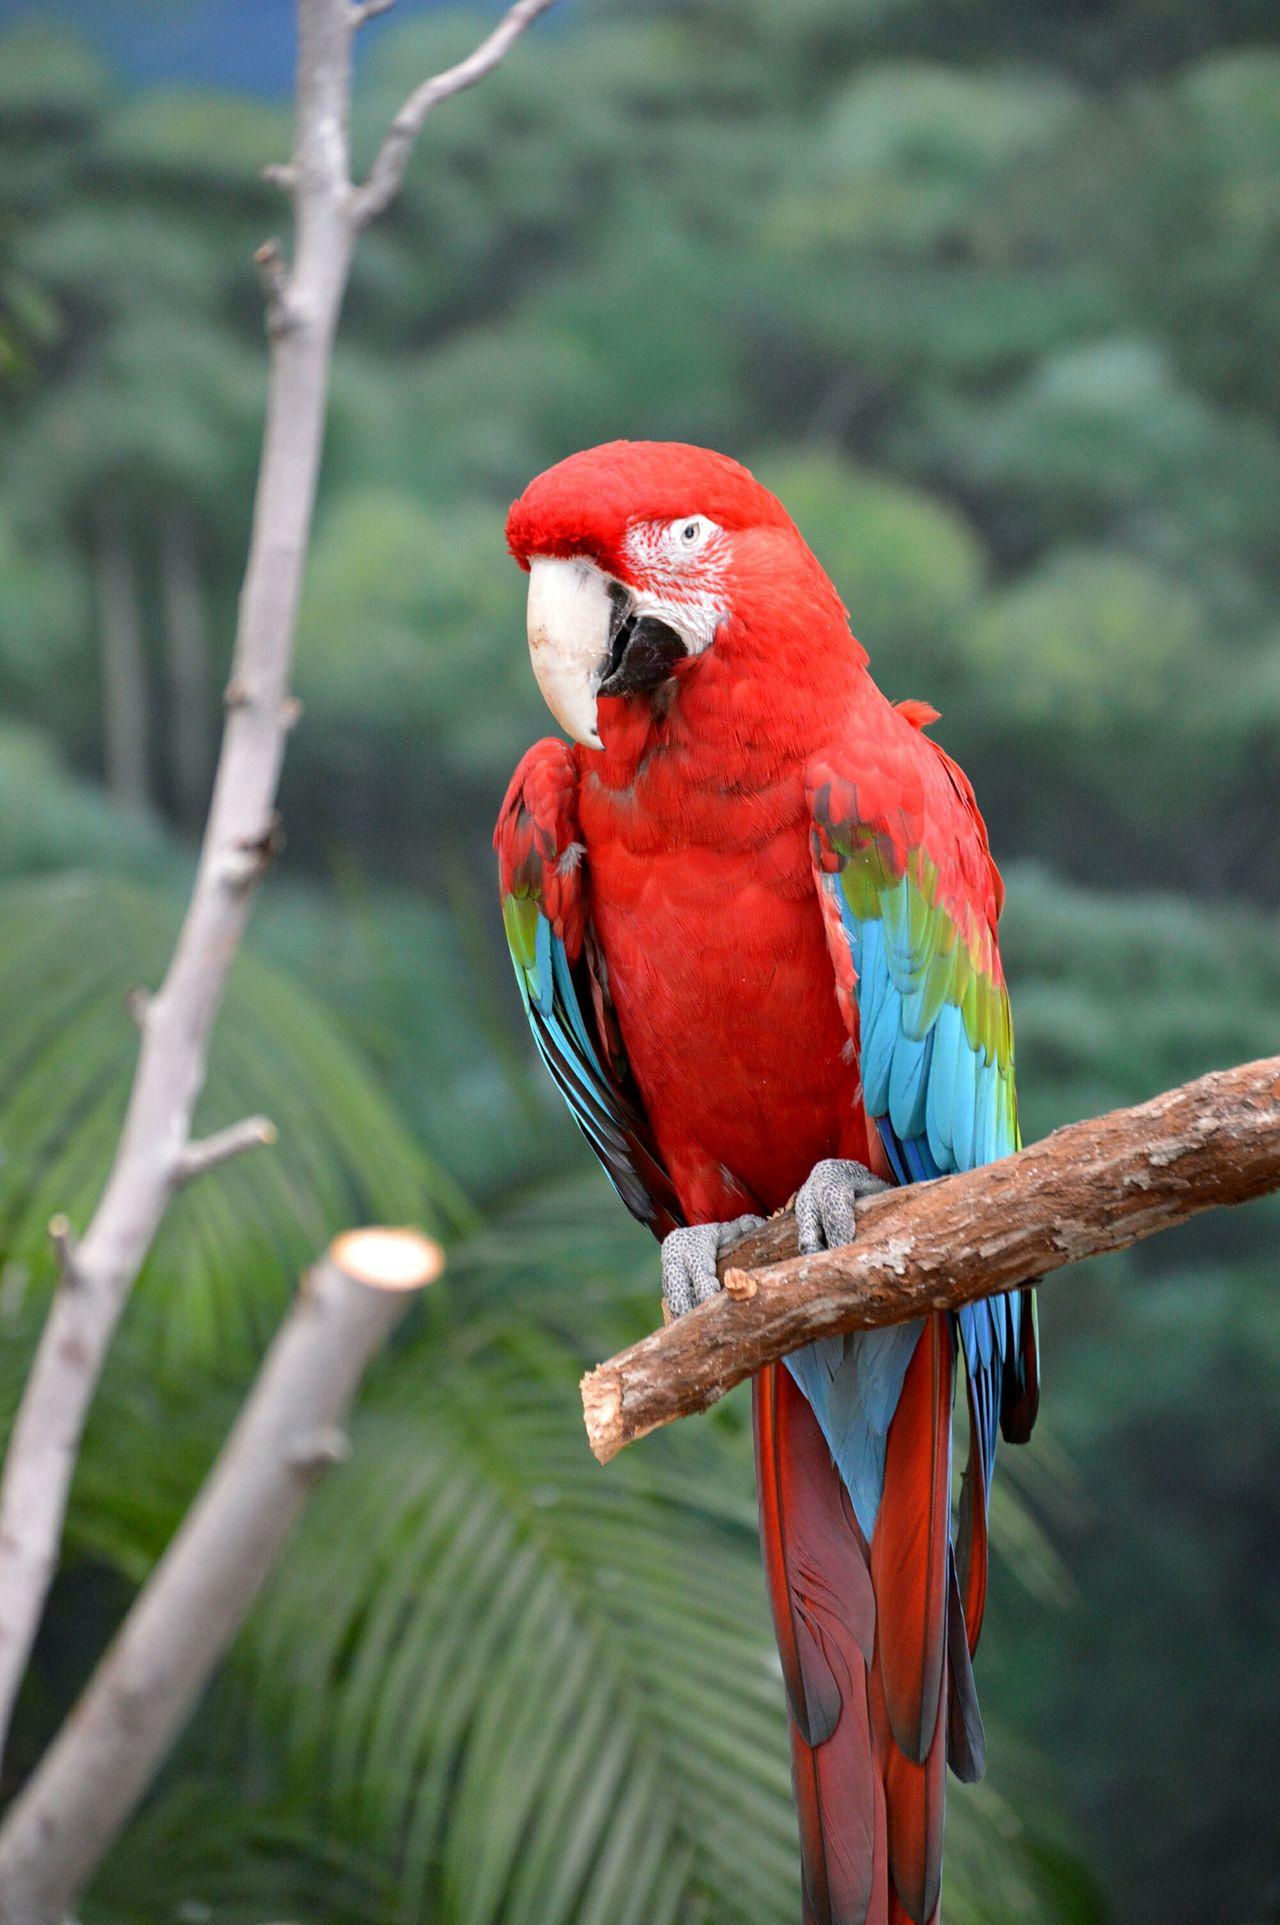 Parrot Redbird Zoo